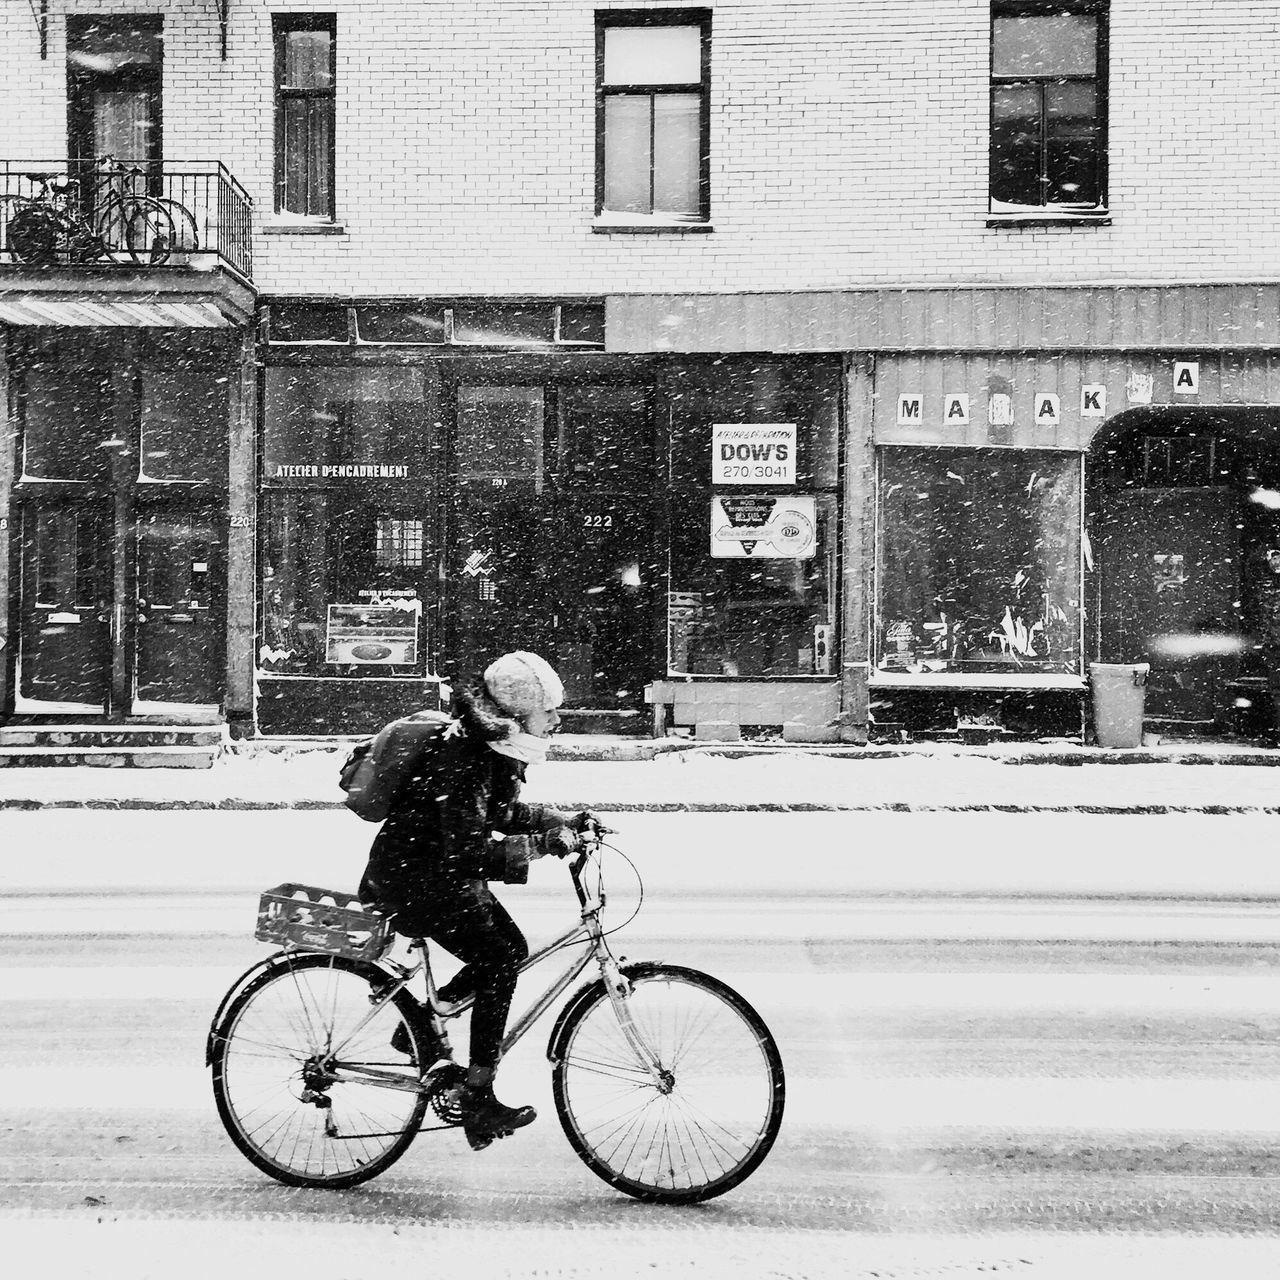 Ridee on the storm EyeEm Best Shots - Black + White Streetphoto_bw Blackandwhite Streetphotography Snow Winter AMPt Community